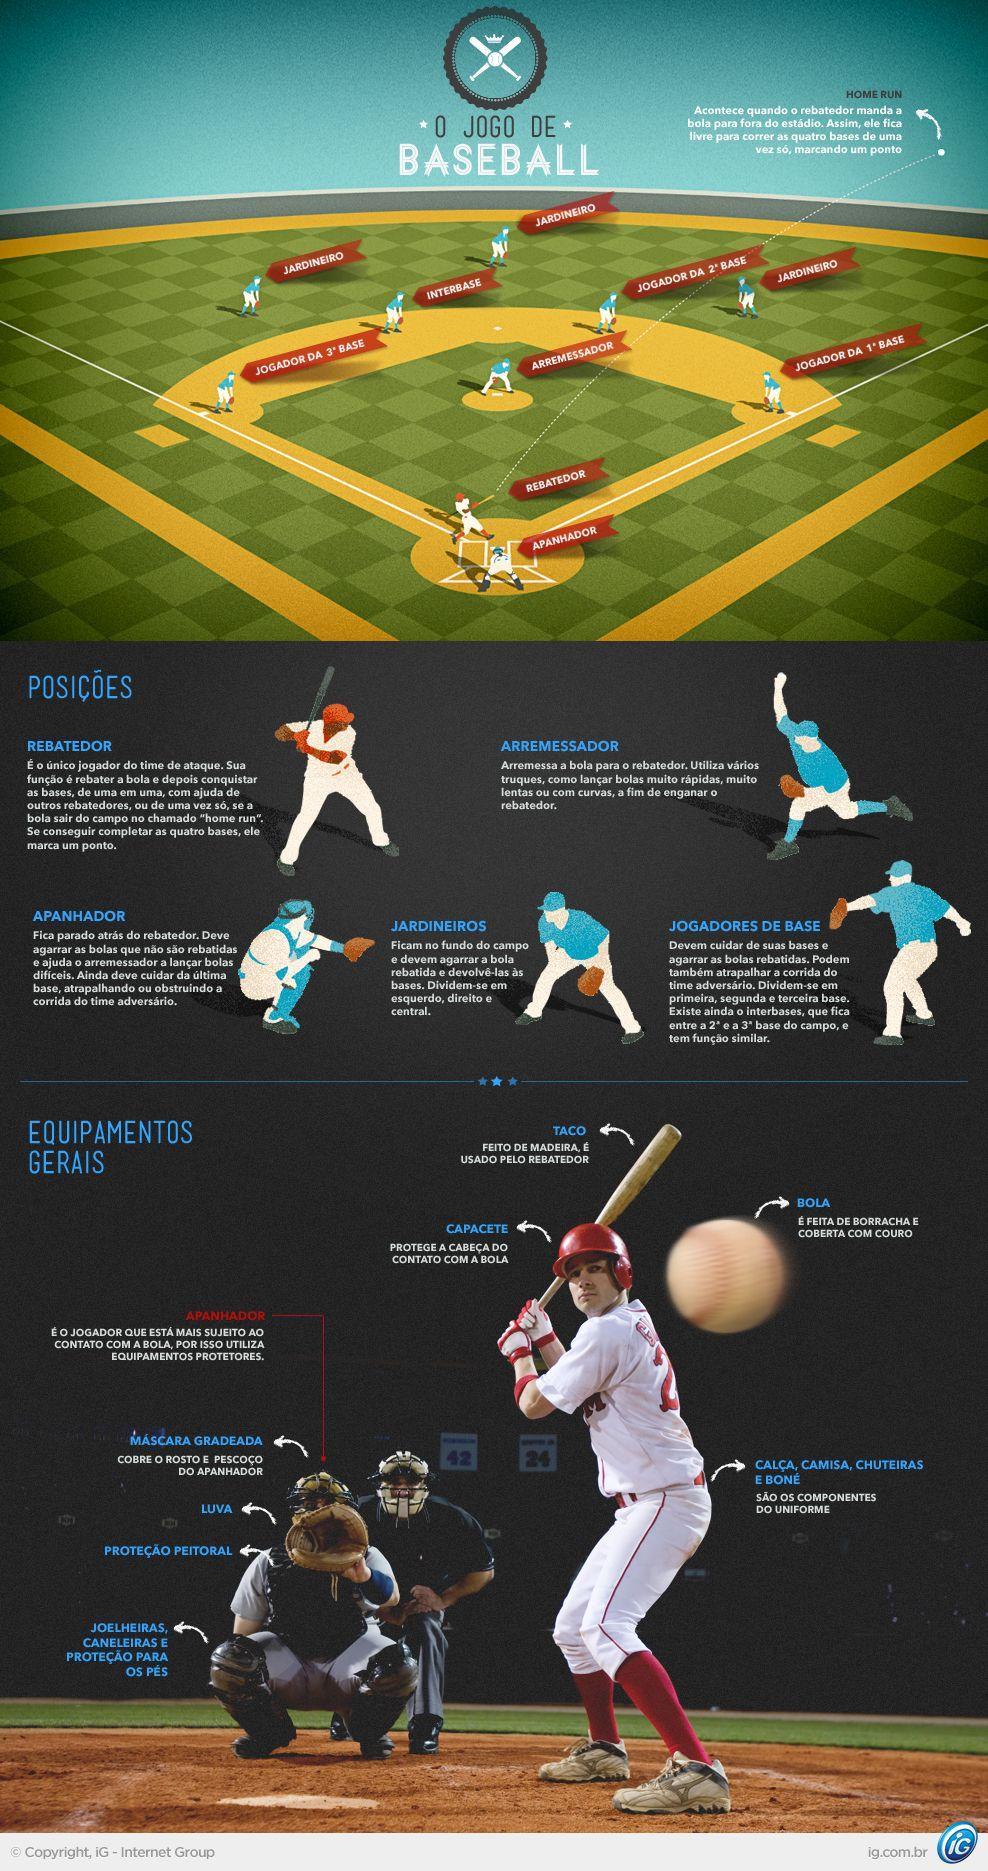 Entenda As Regras E Equipamentos Do Beisebol Mix Ig Beisebol Esportes Olímpicos Esportes